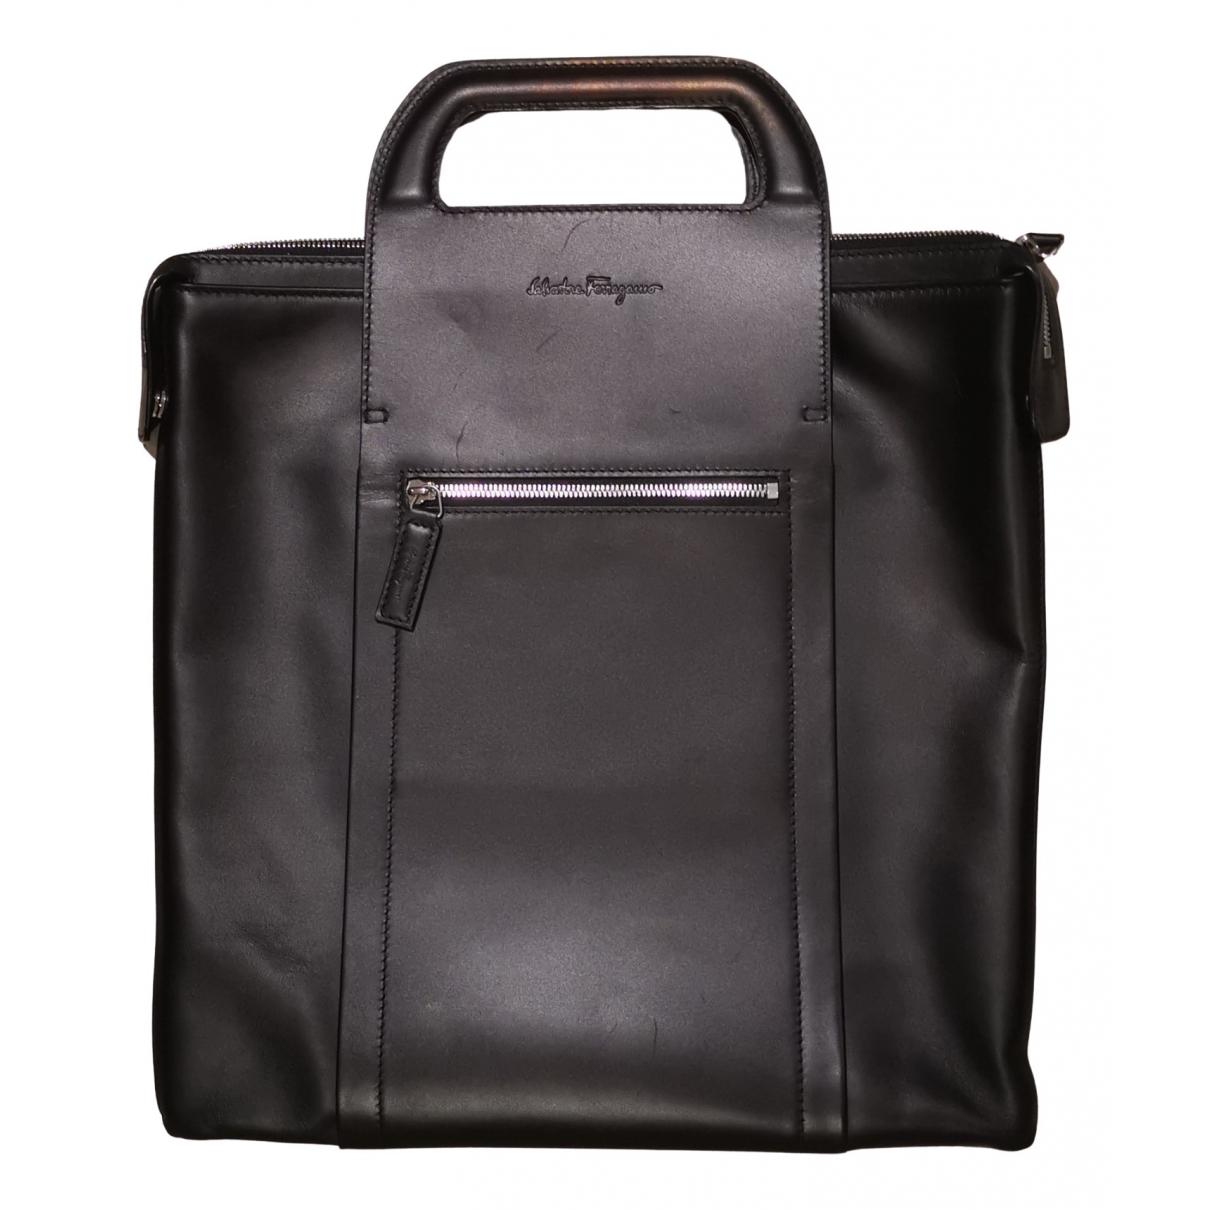 Salvatore Ferragamo \N Black Leather bag for Men \N